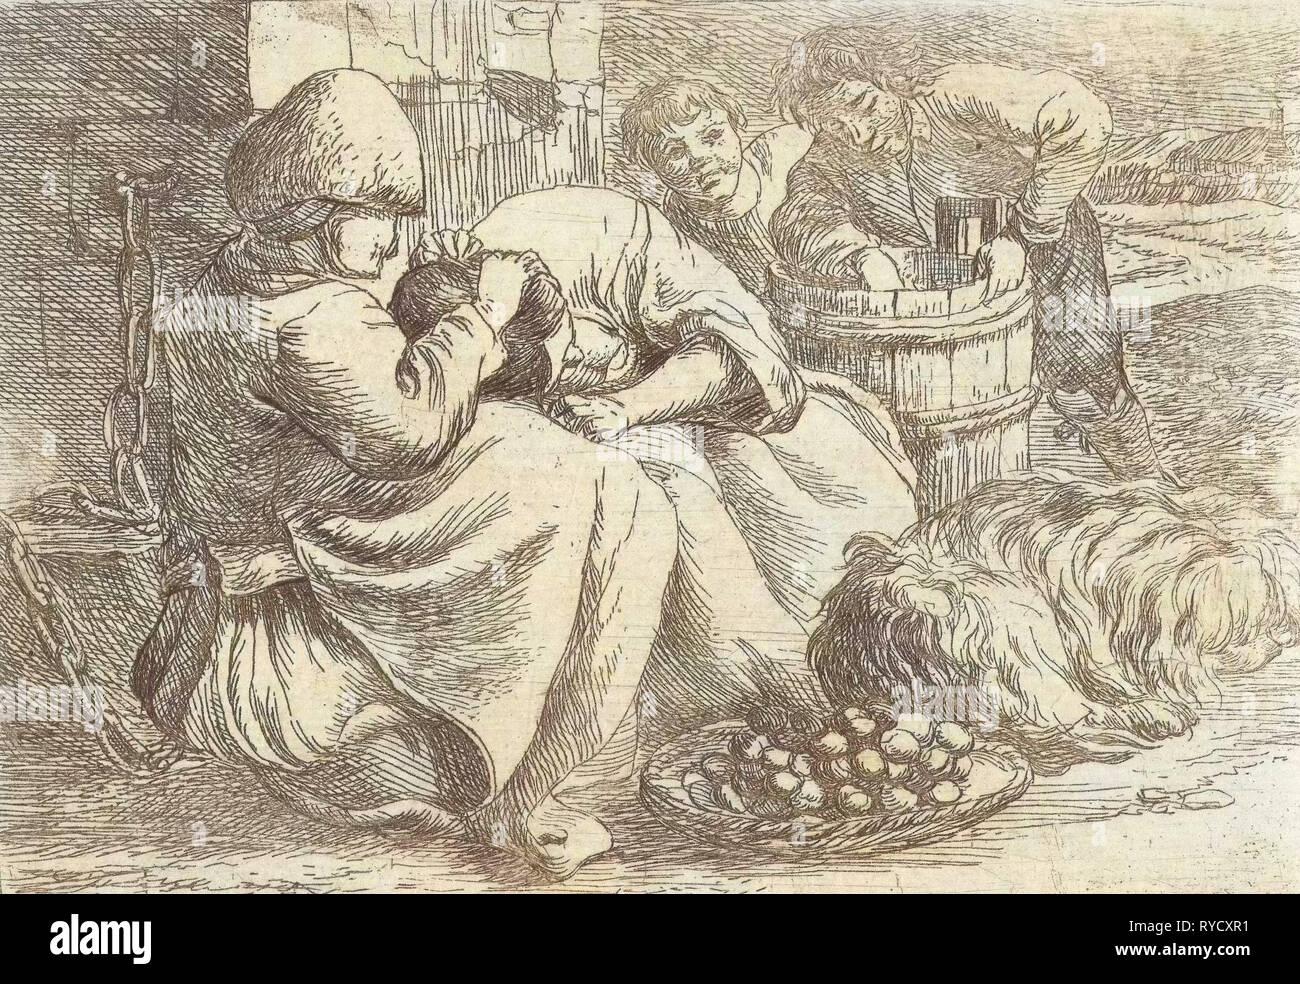 Old woman delouses a girl, Jan van Ossenbeeck, 1647 - 1674 - Stock Image